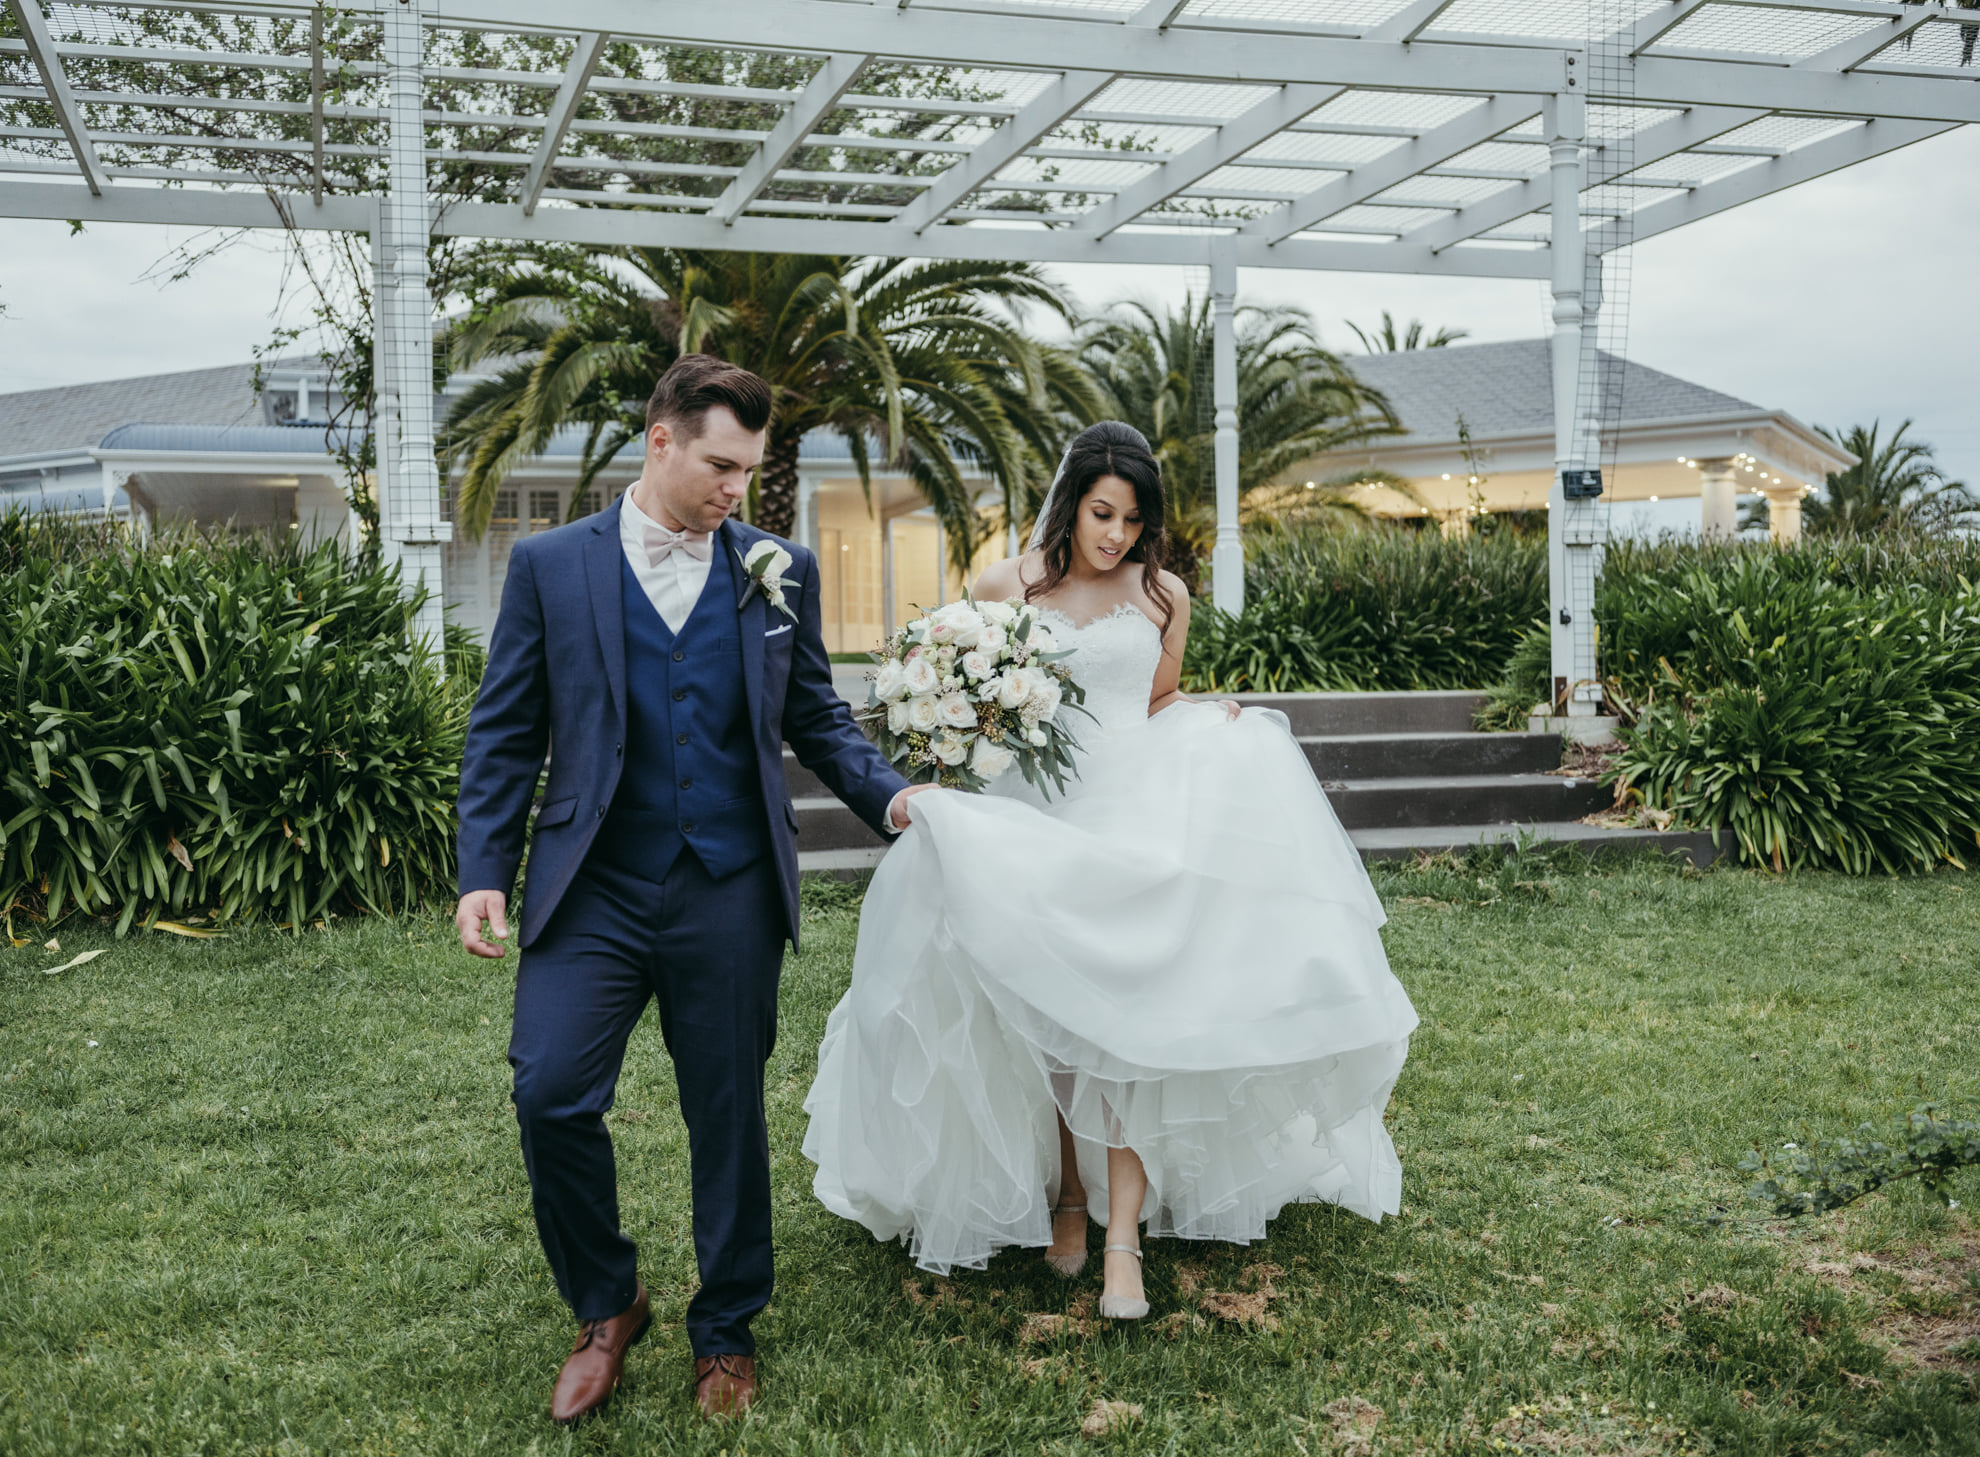 Traditional bridal alterations